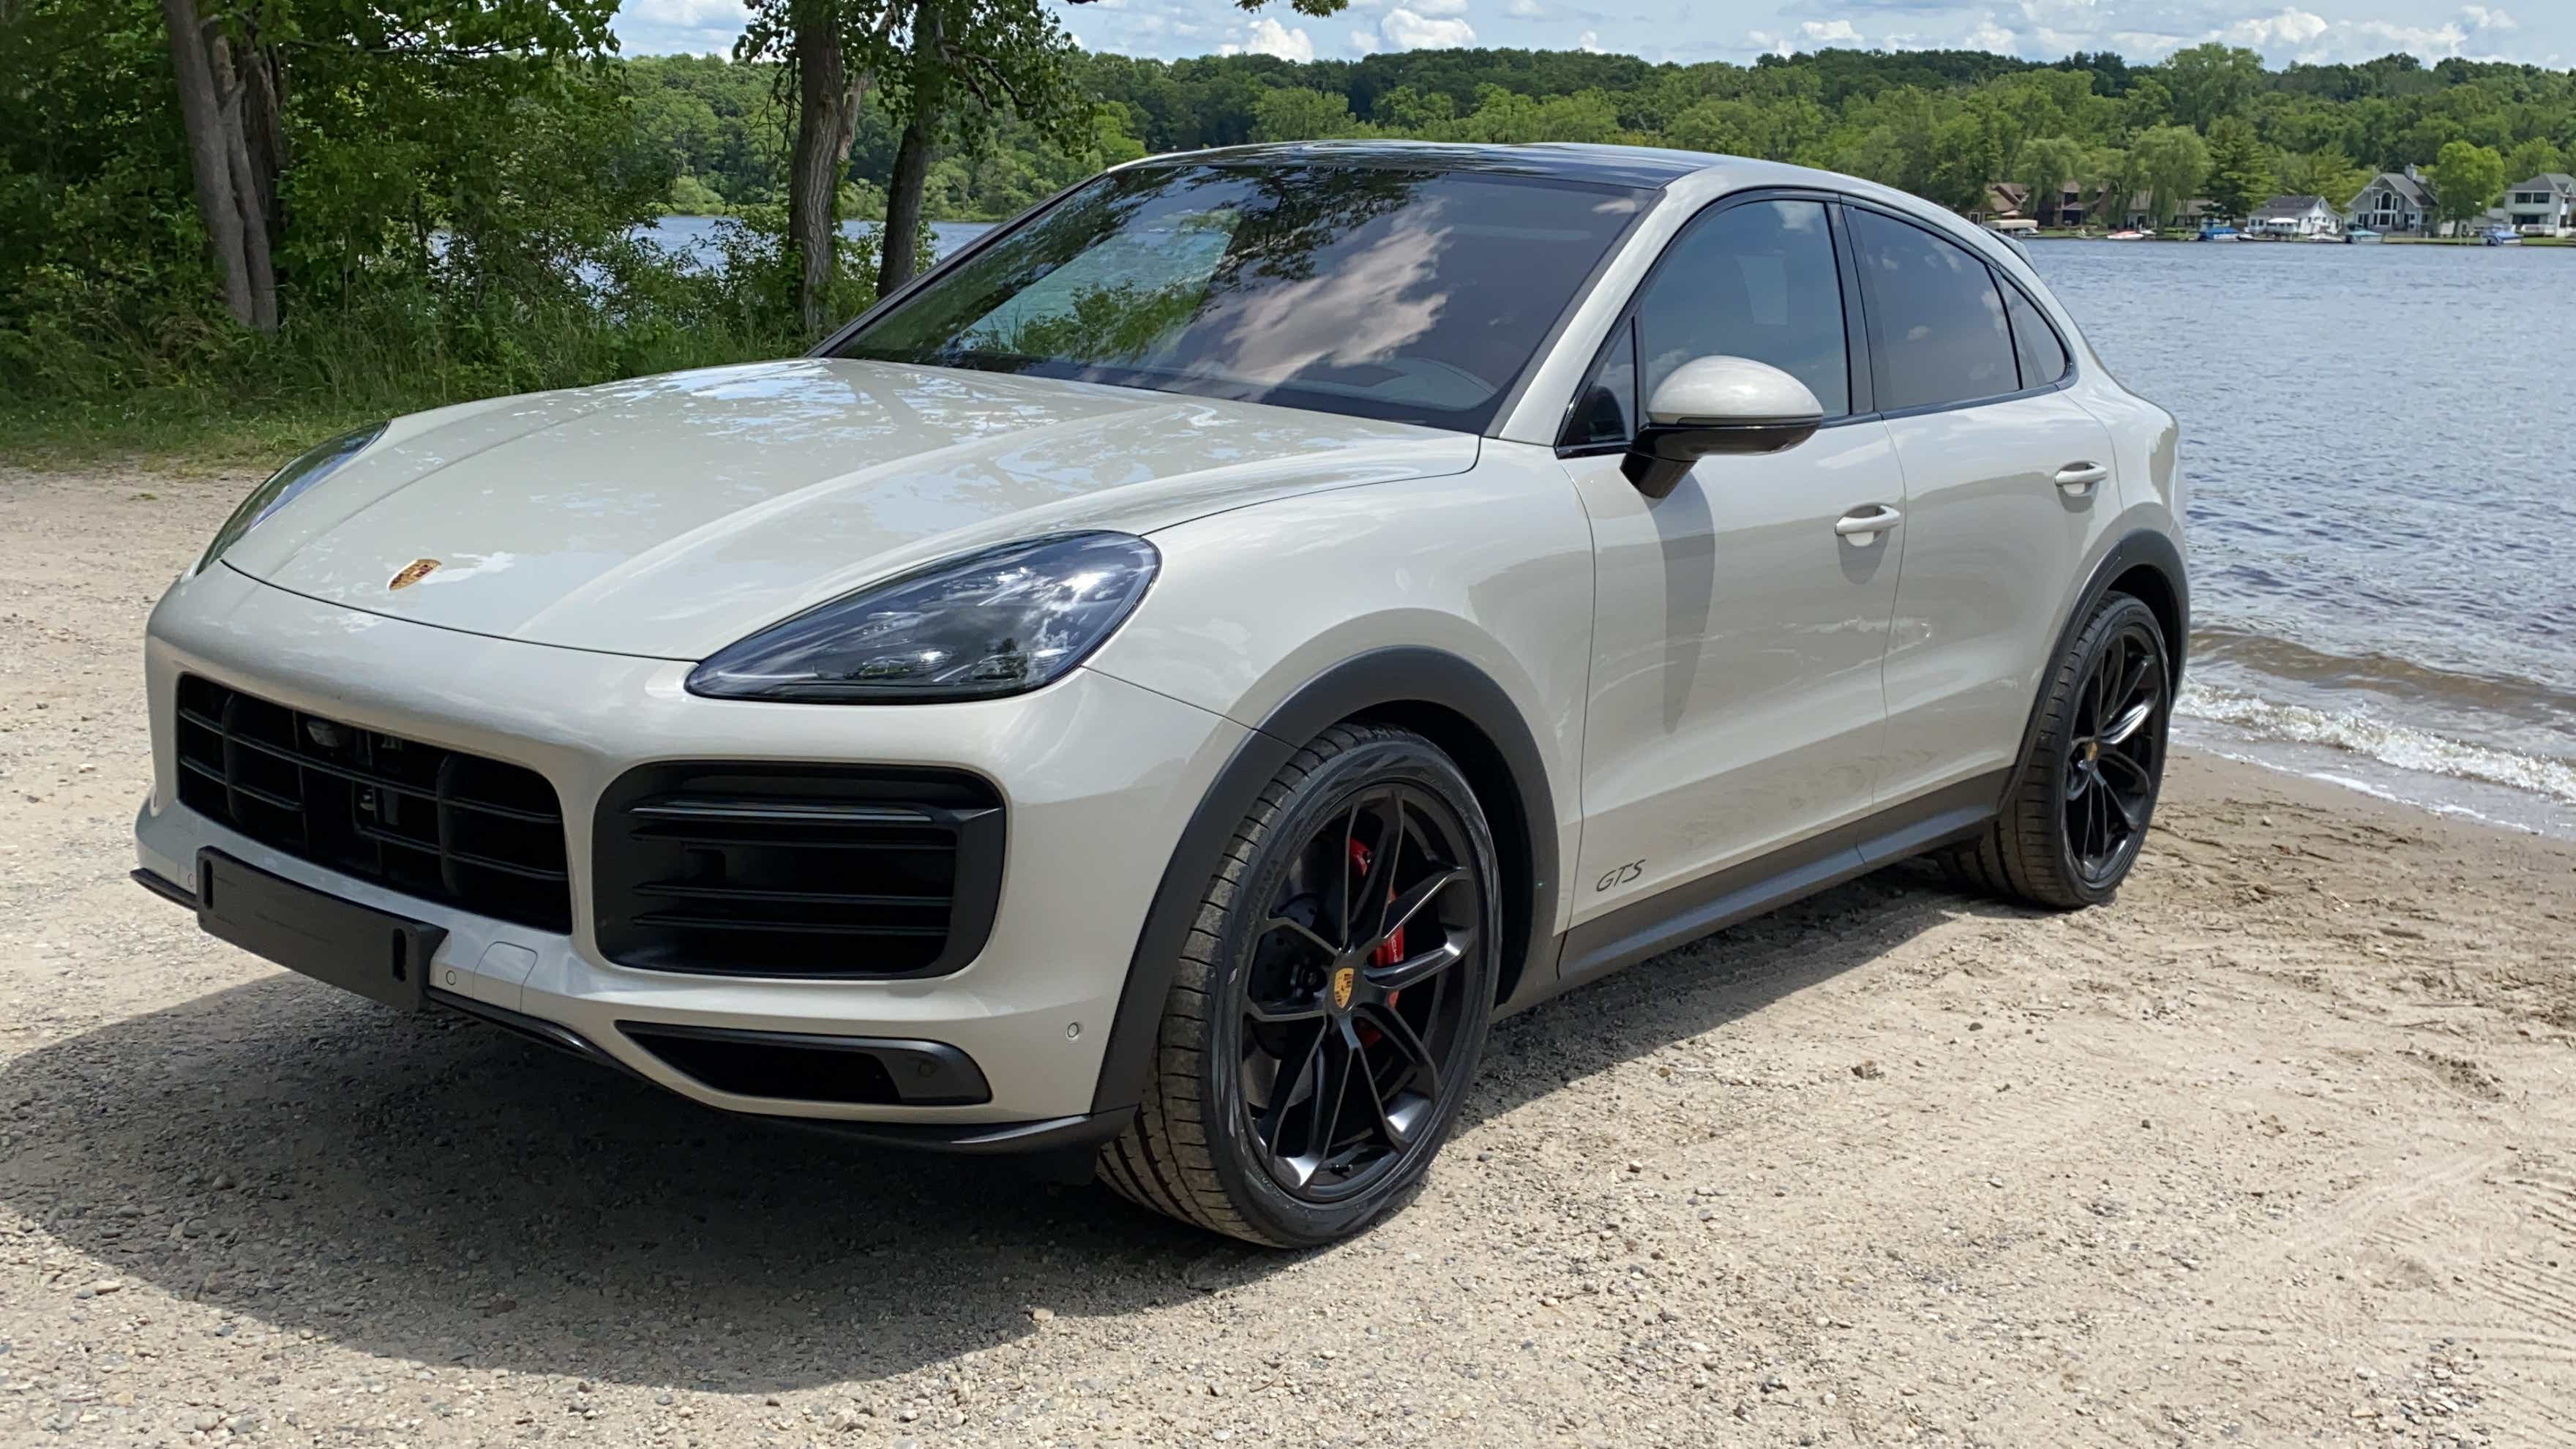 2021 Porsche Cayenne Gts Suv Spices Up Luxury Performance Race